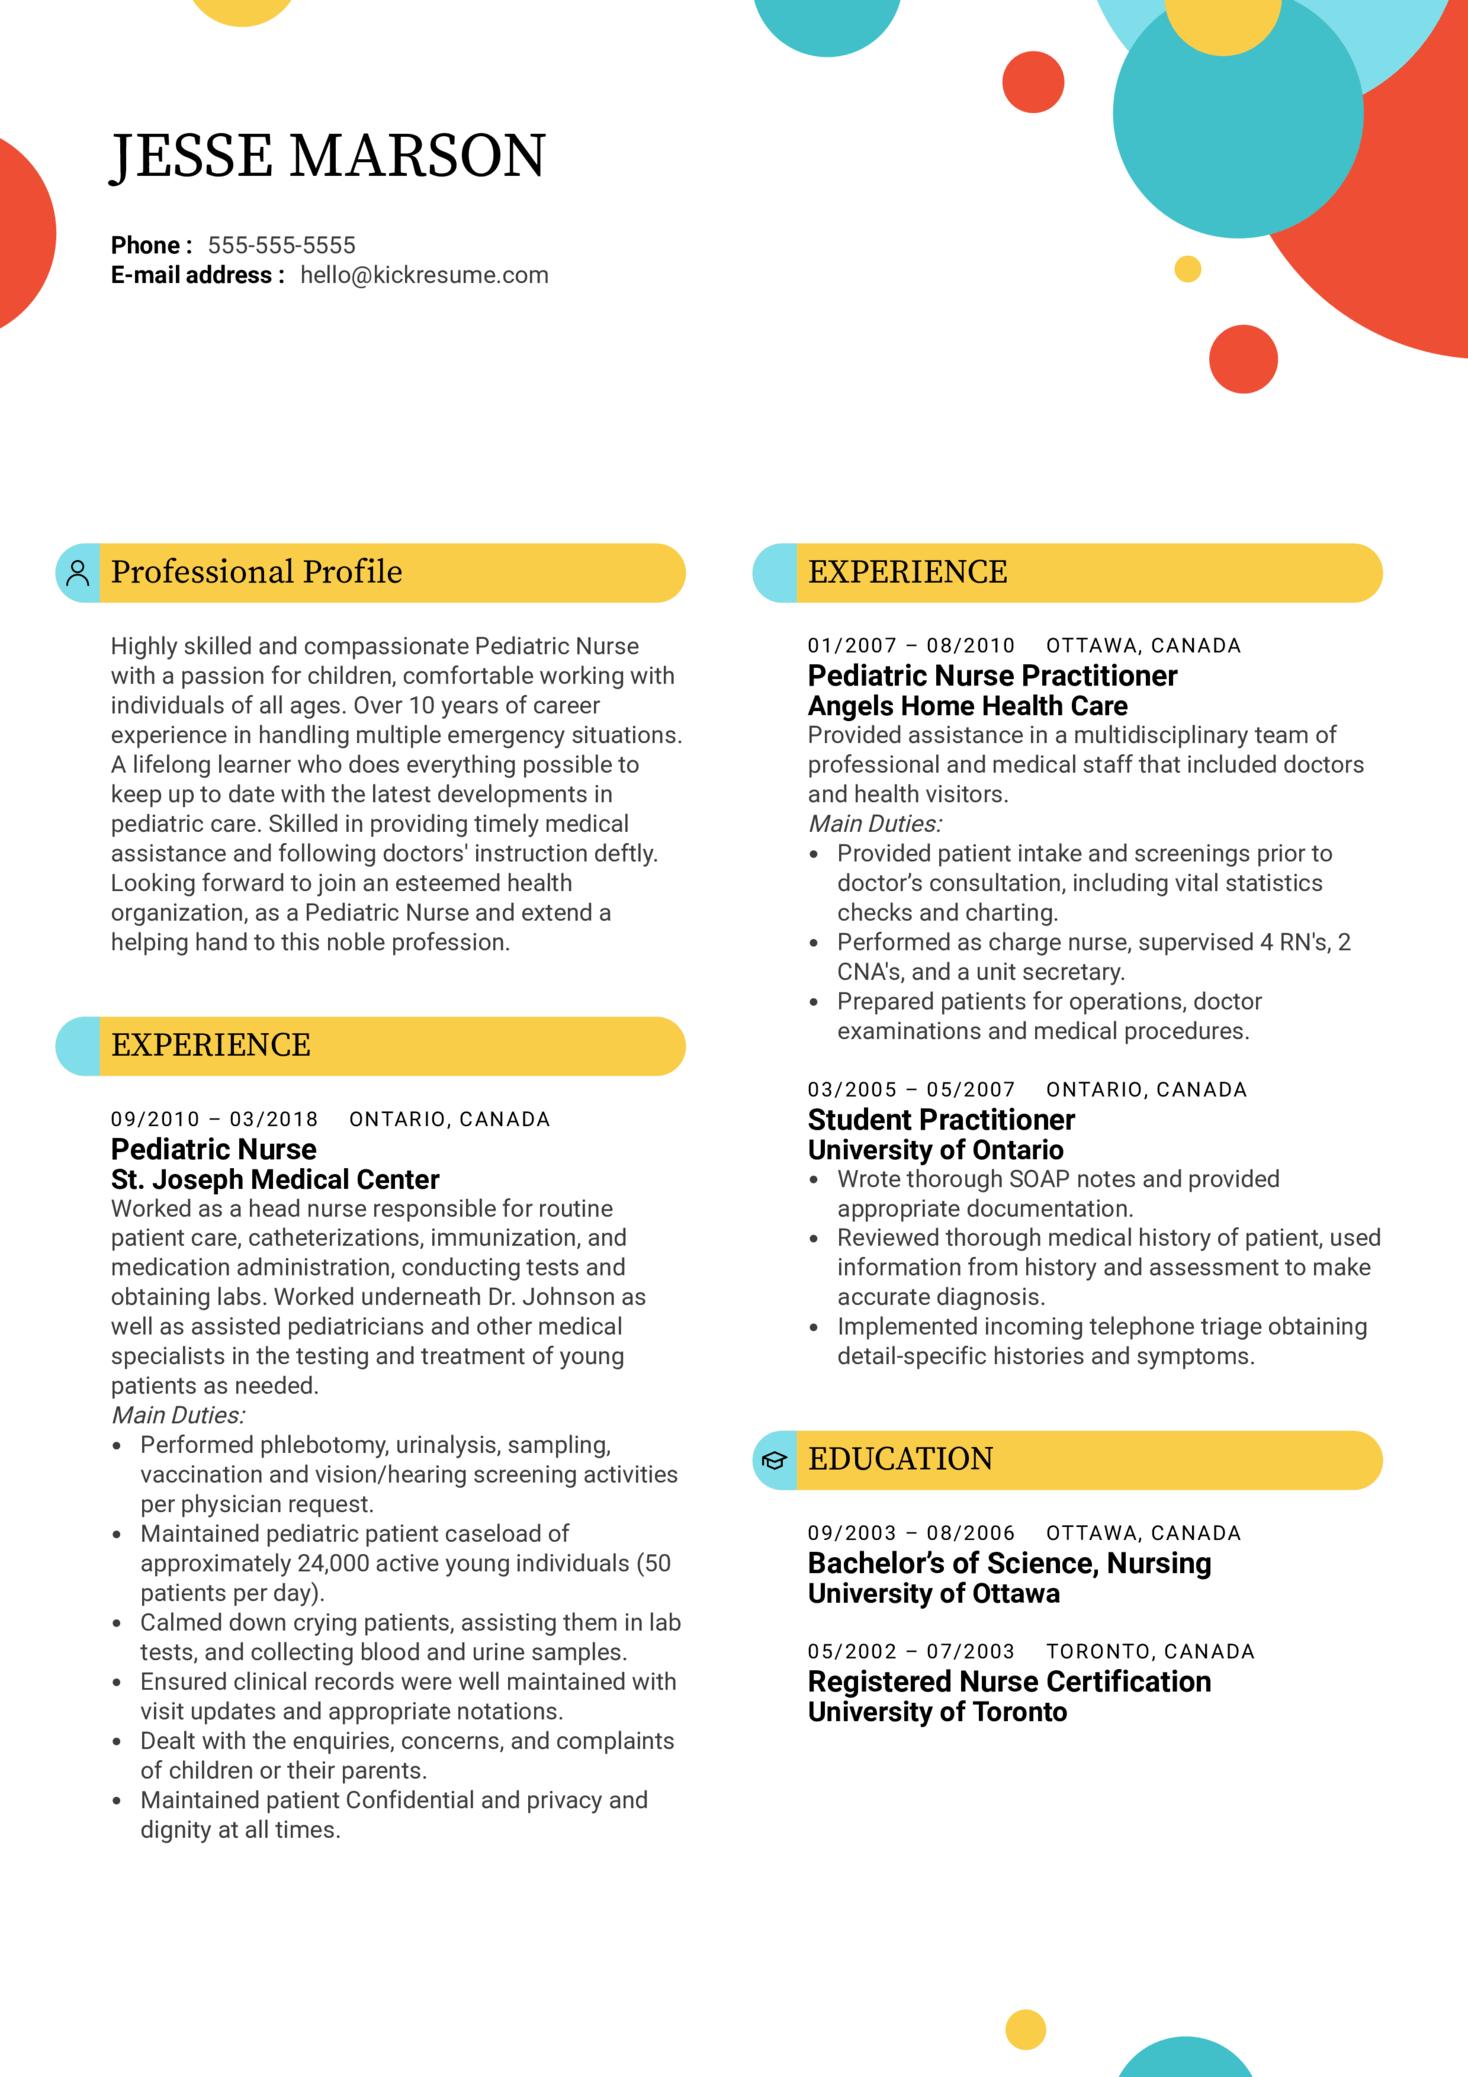 Pediatric Nurse Resume Example (Part 1)